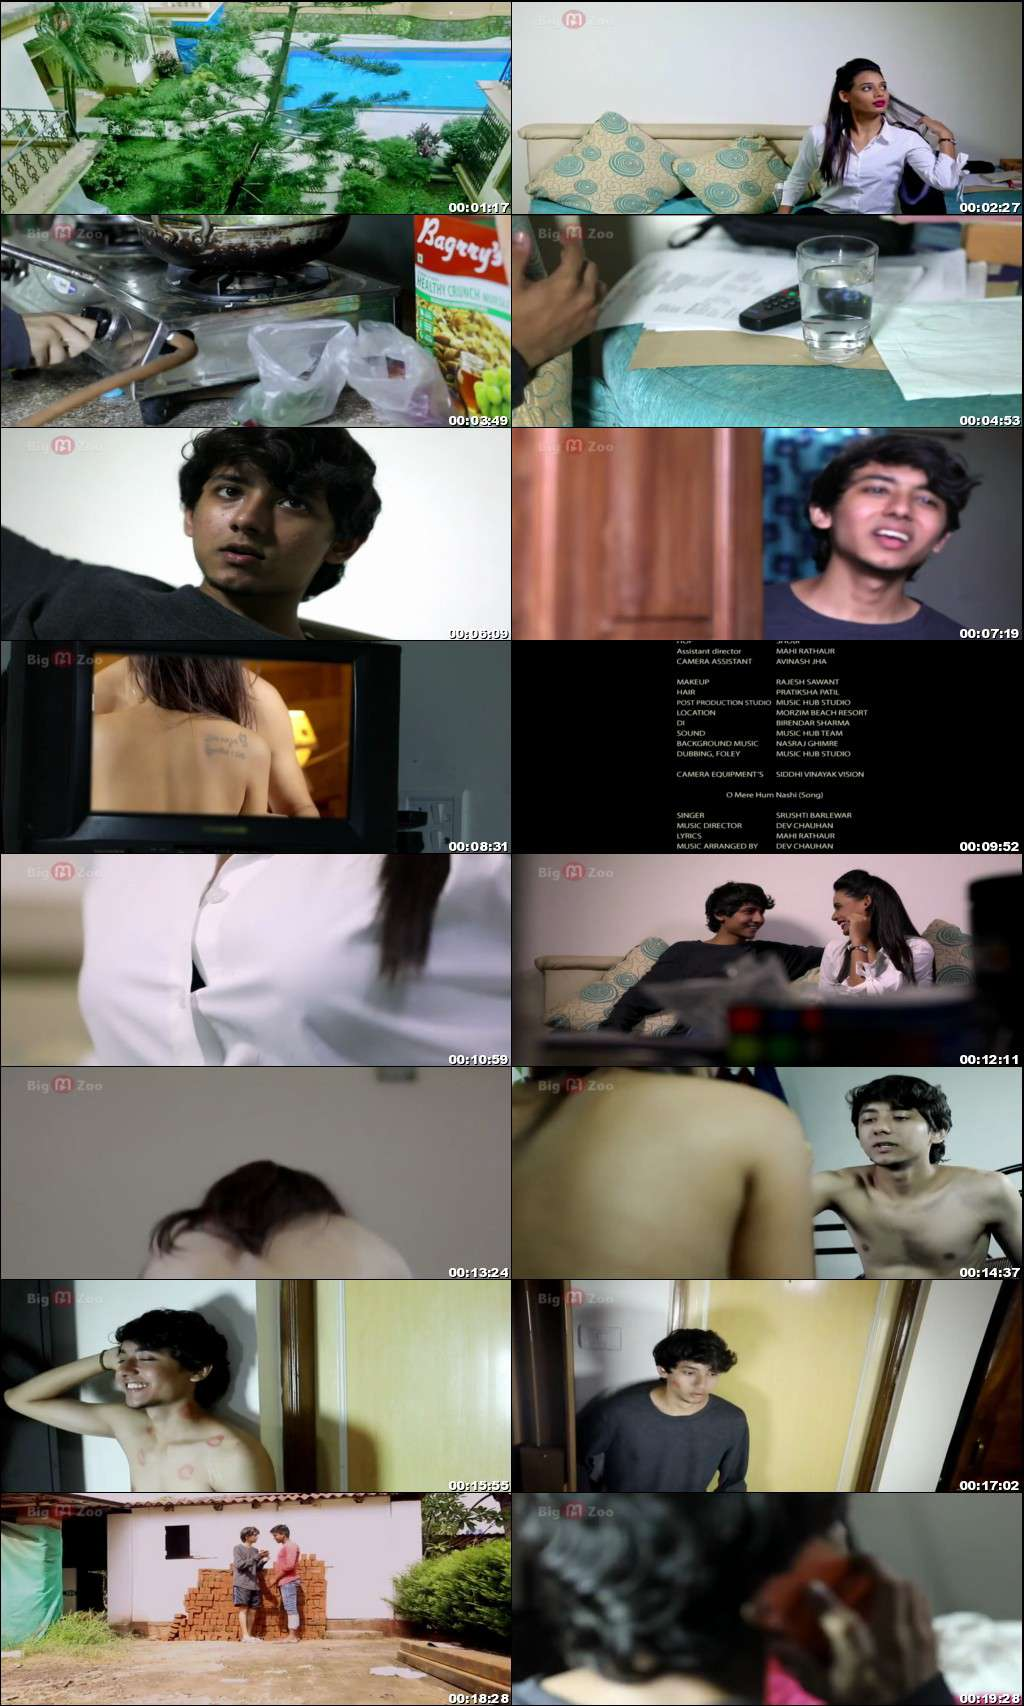 Sales Girl 2020 S01 Big Movie Zoo App Originals Hindi Web Series 720p HDRip x264 140MB Download HD